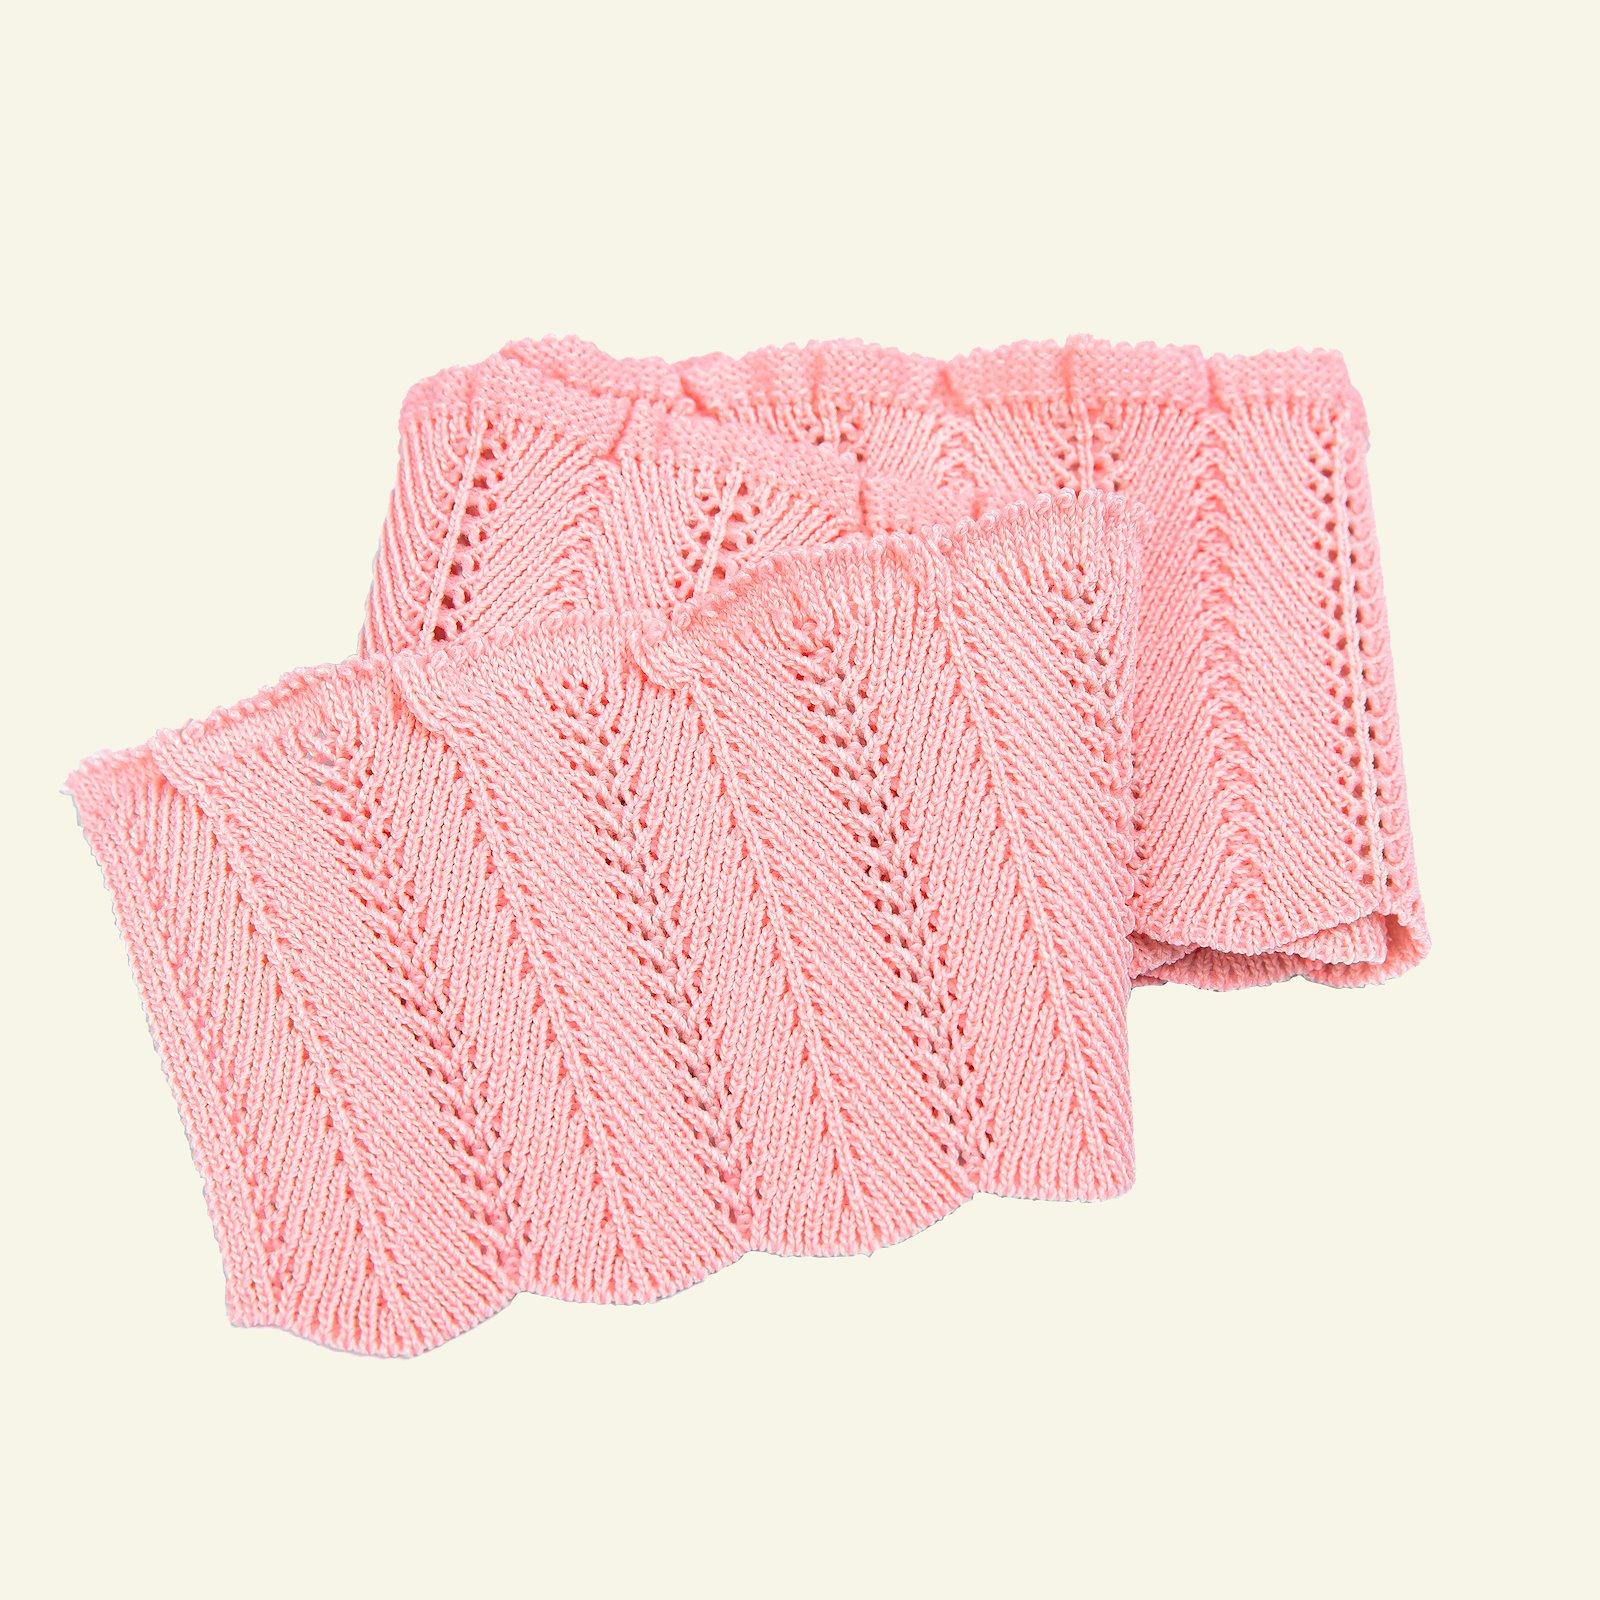 Rib knitted 6x55cm powder pink 1pc 96137_pack